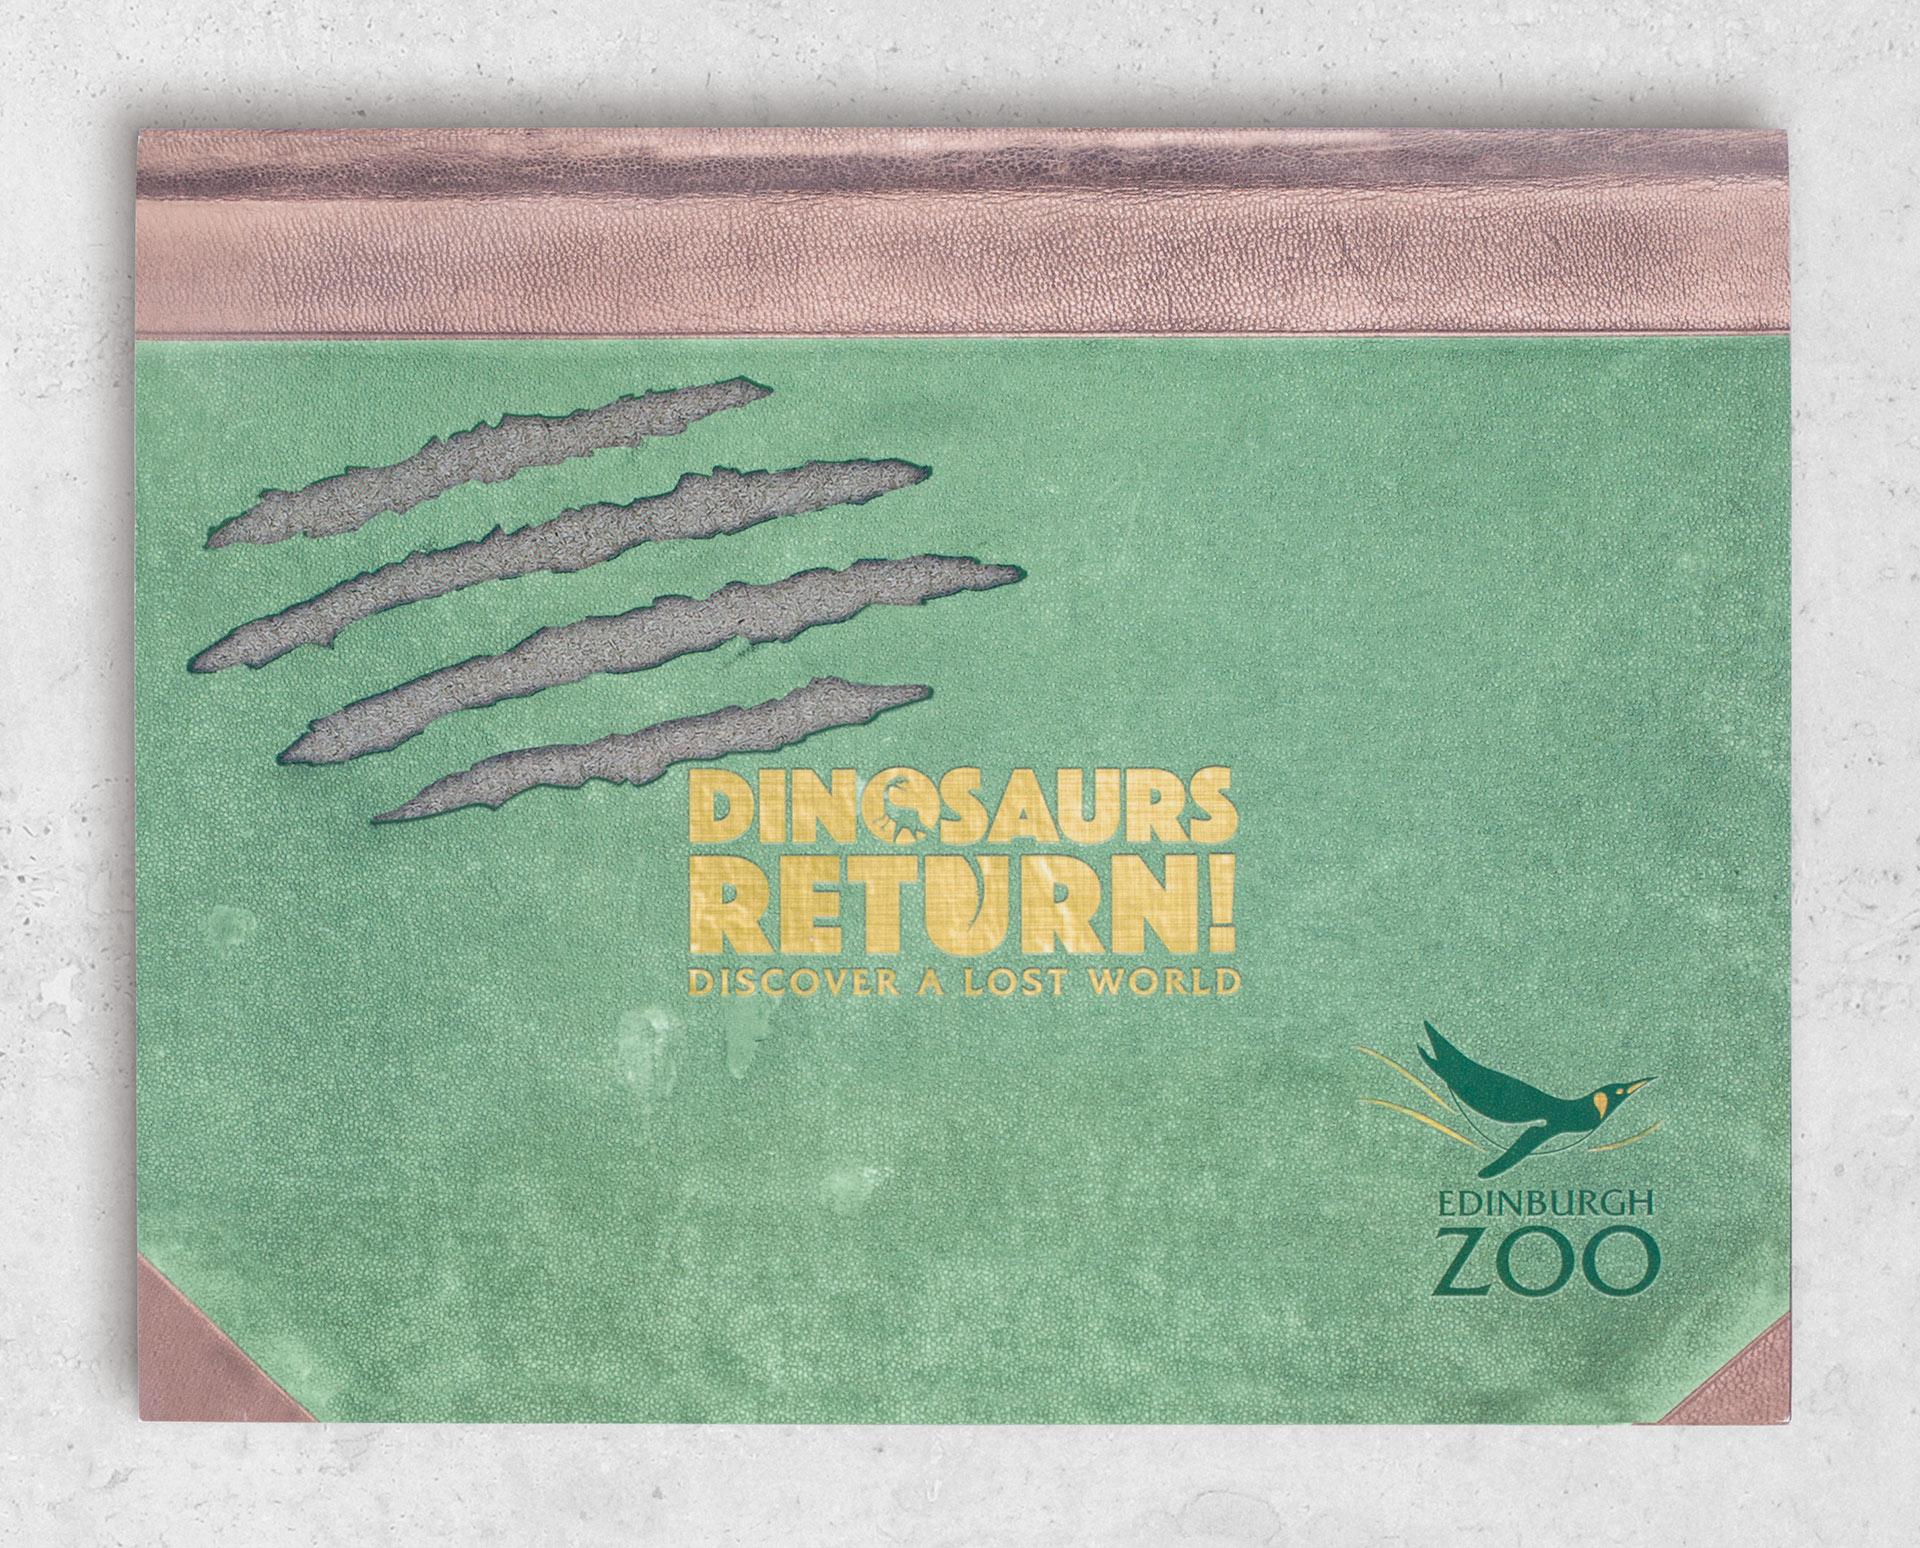 edinburgh-zoo-book-design